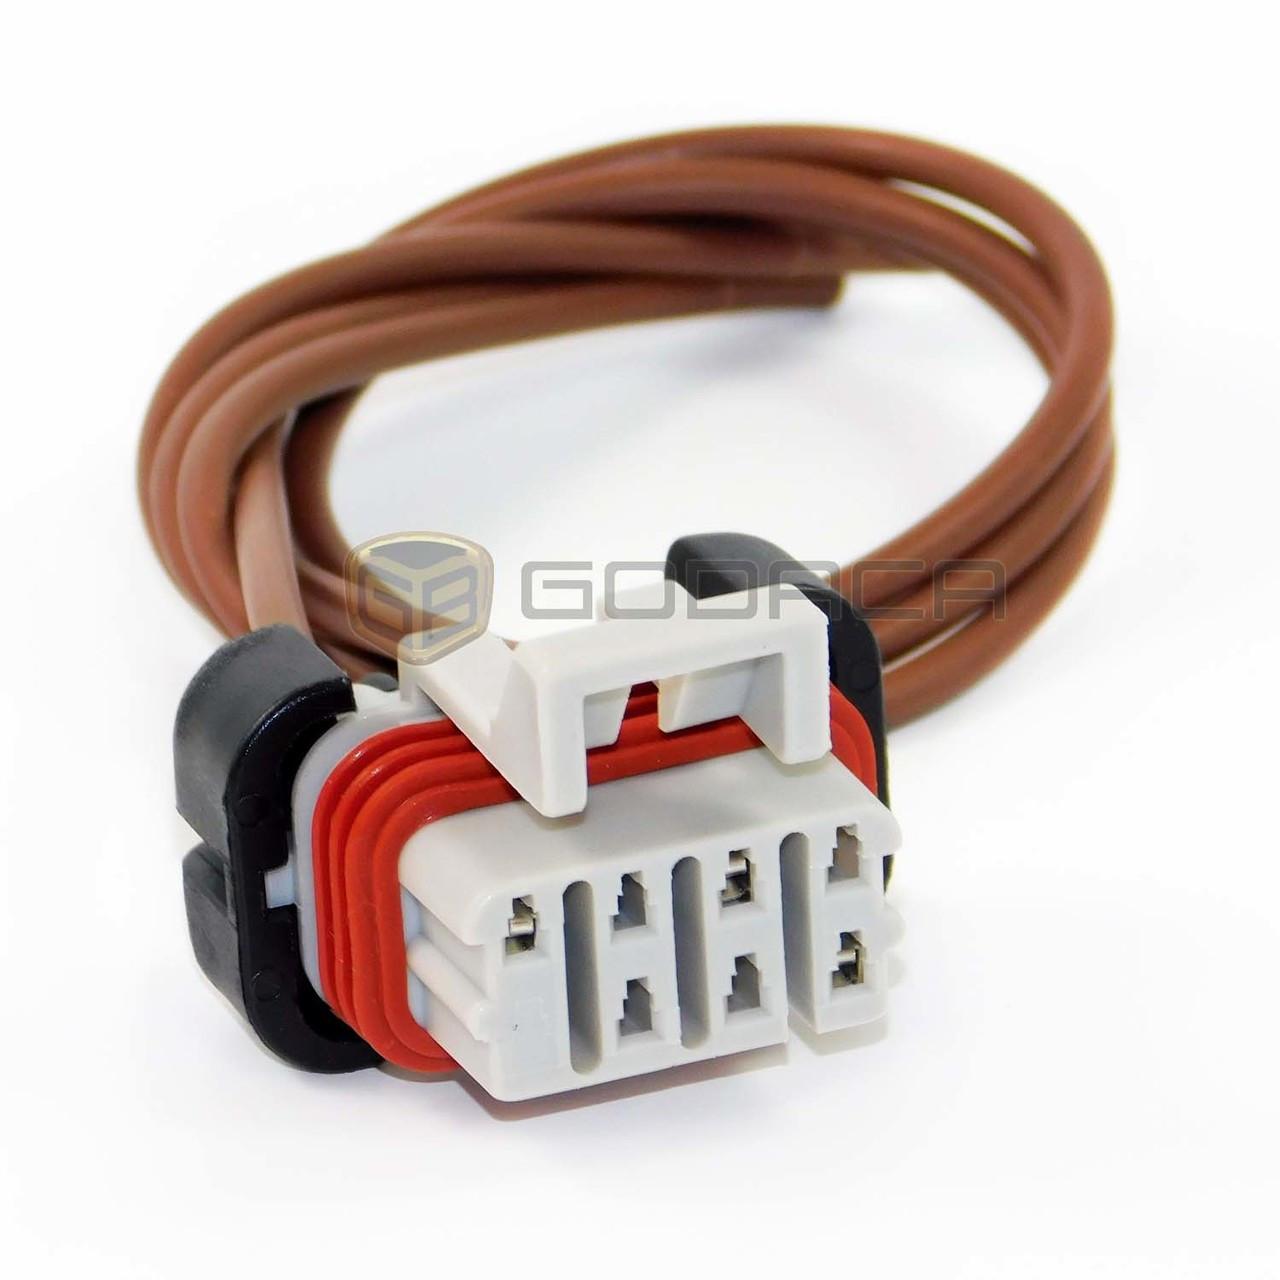 medium resolution of 1x connector 7 way 3 wires for freightliner columbia headlight bulb godaca llc